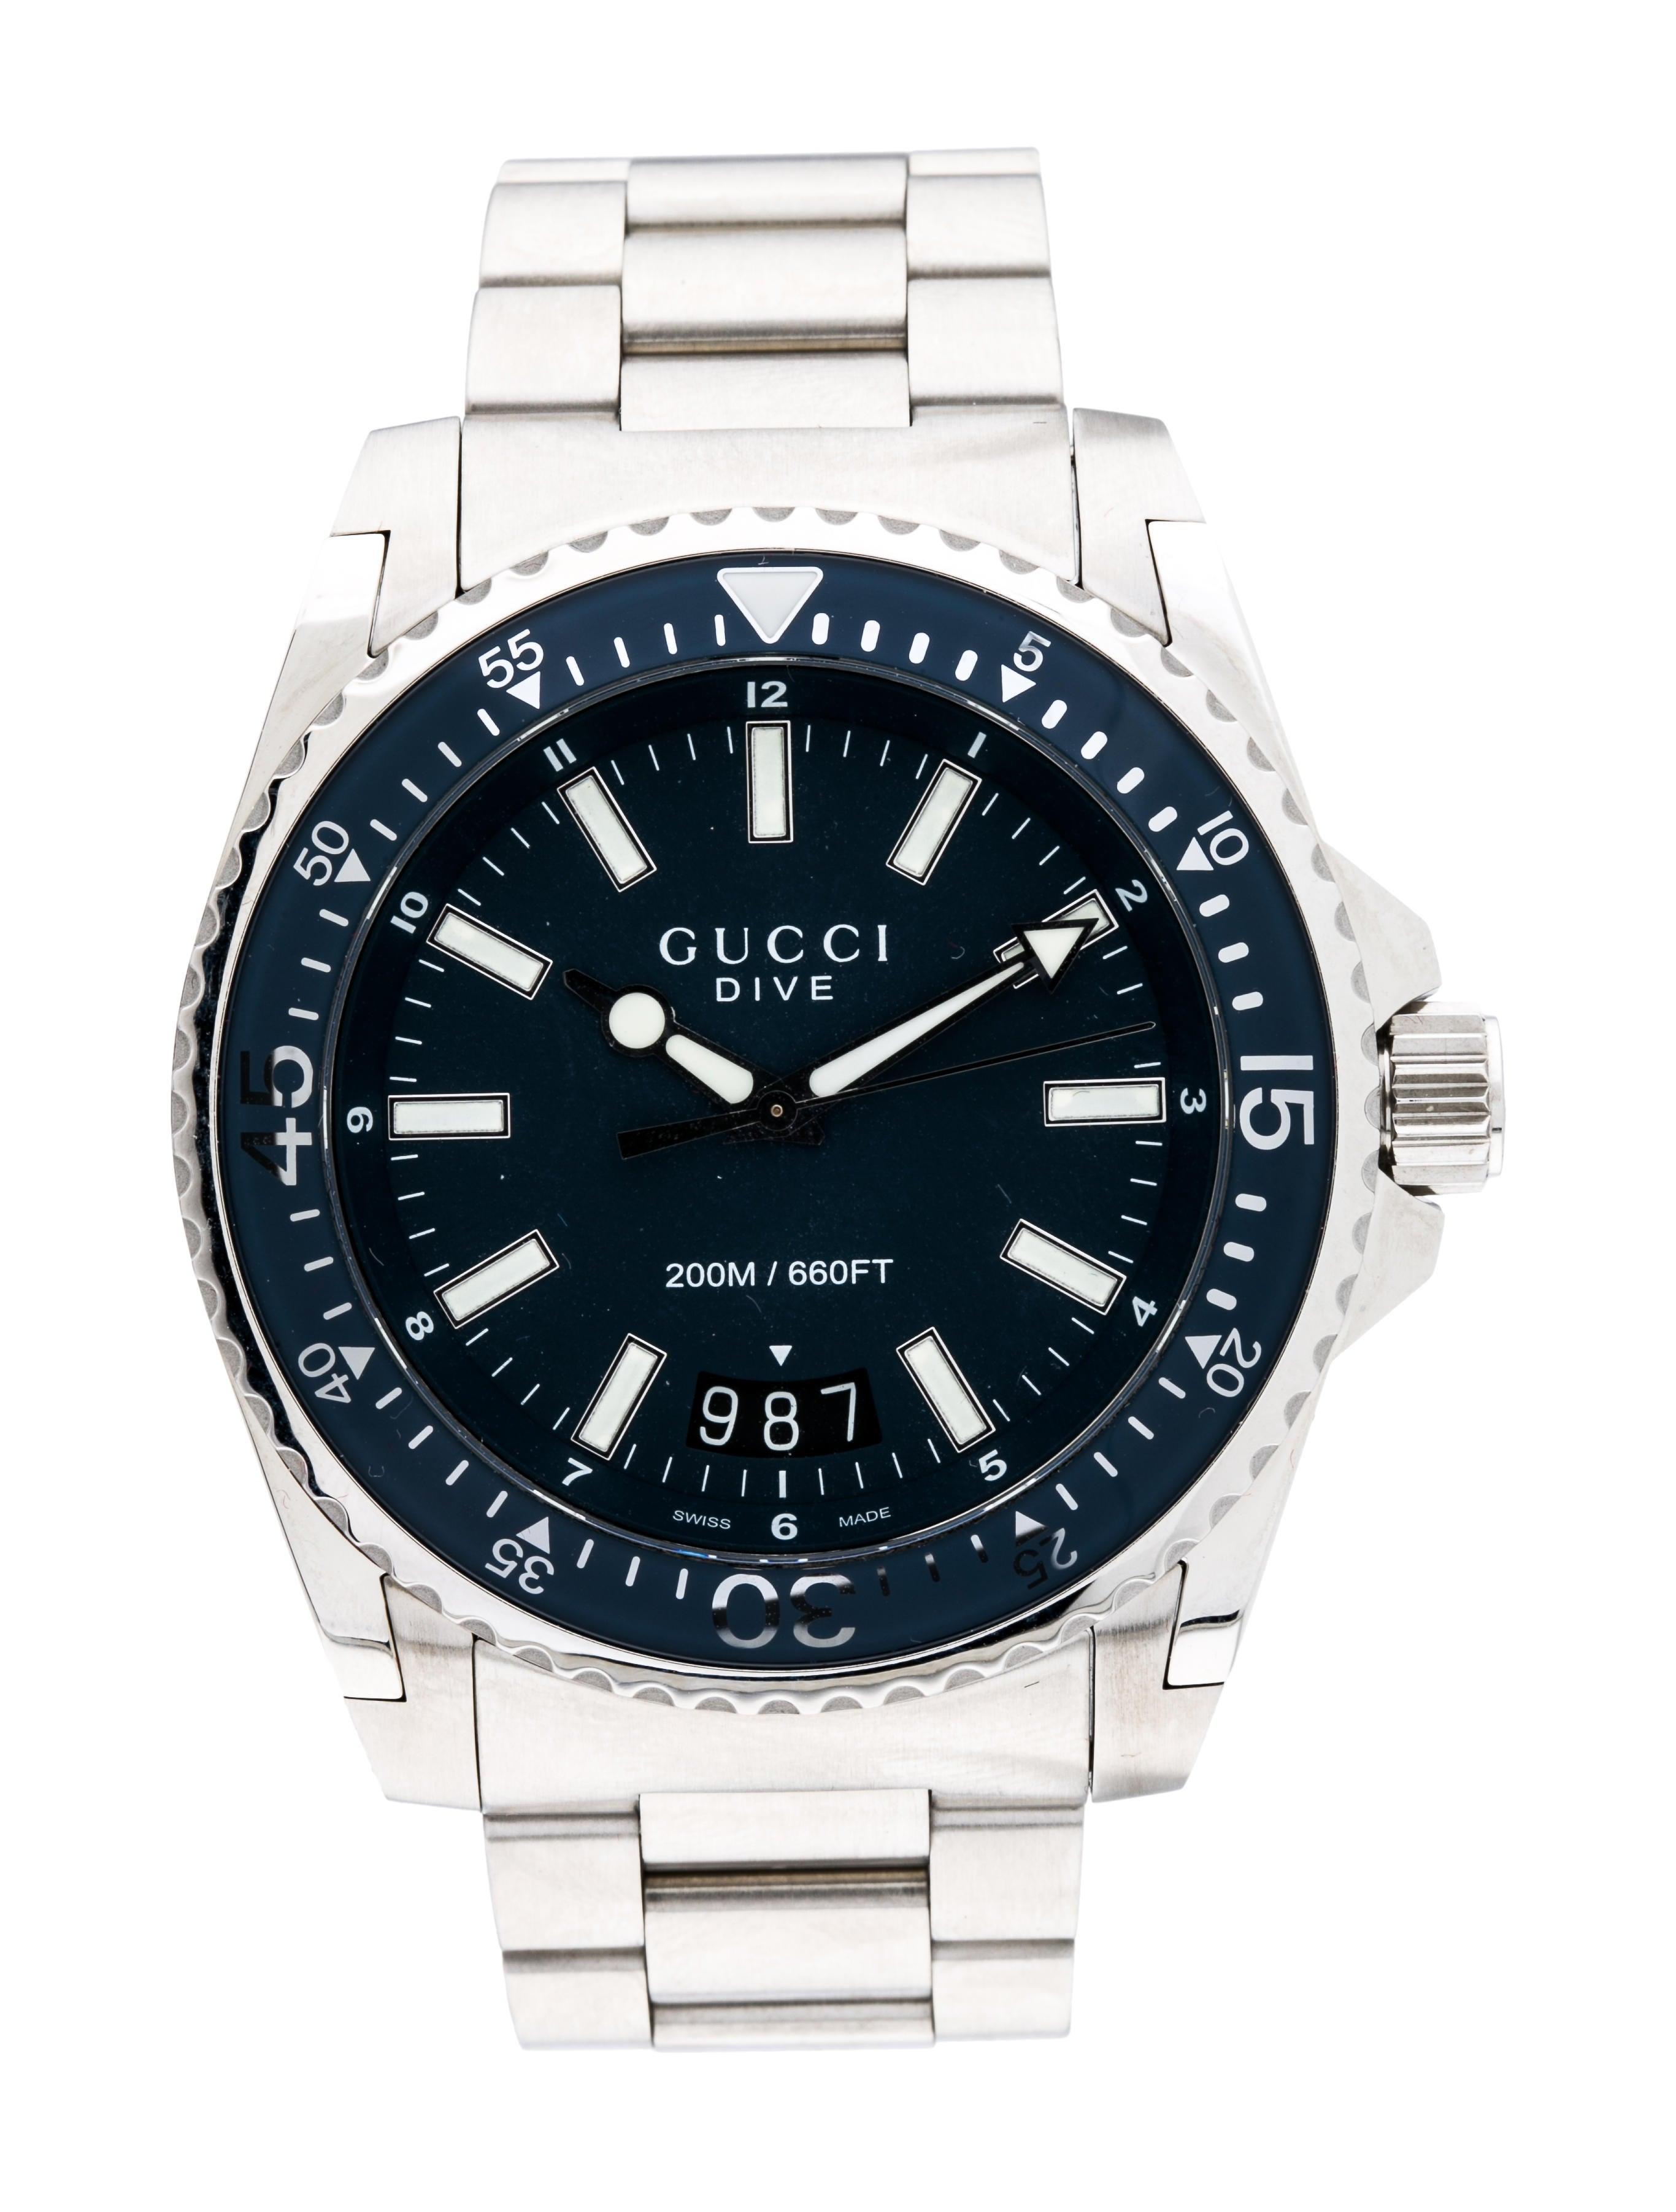 484463fd277 Gucci Dive XL Watch - Bracelet - GUC222697